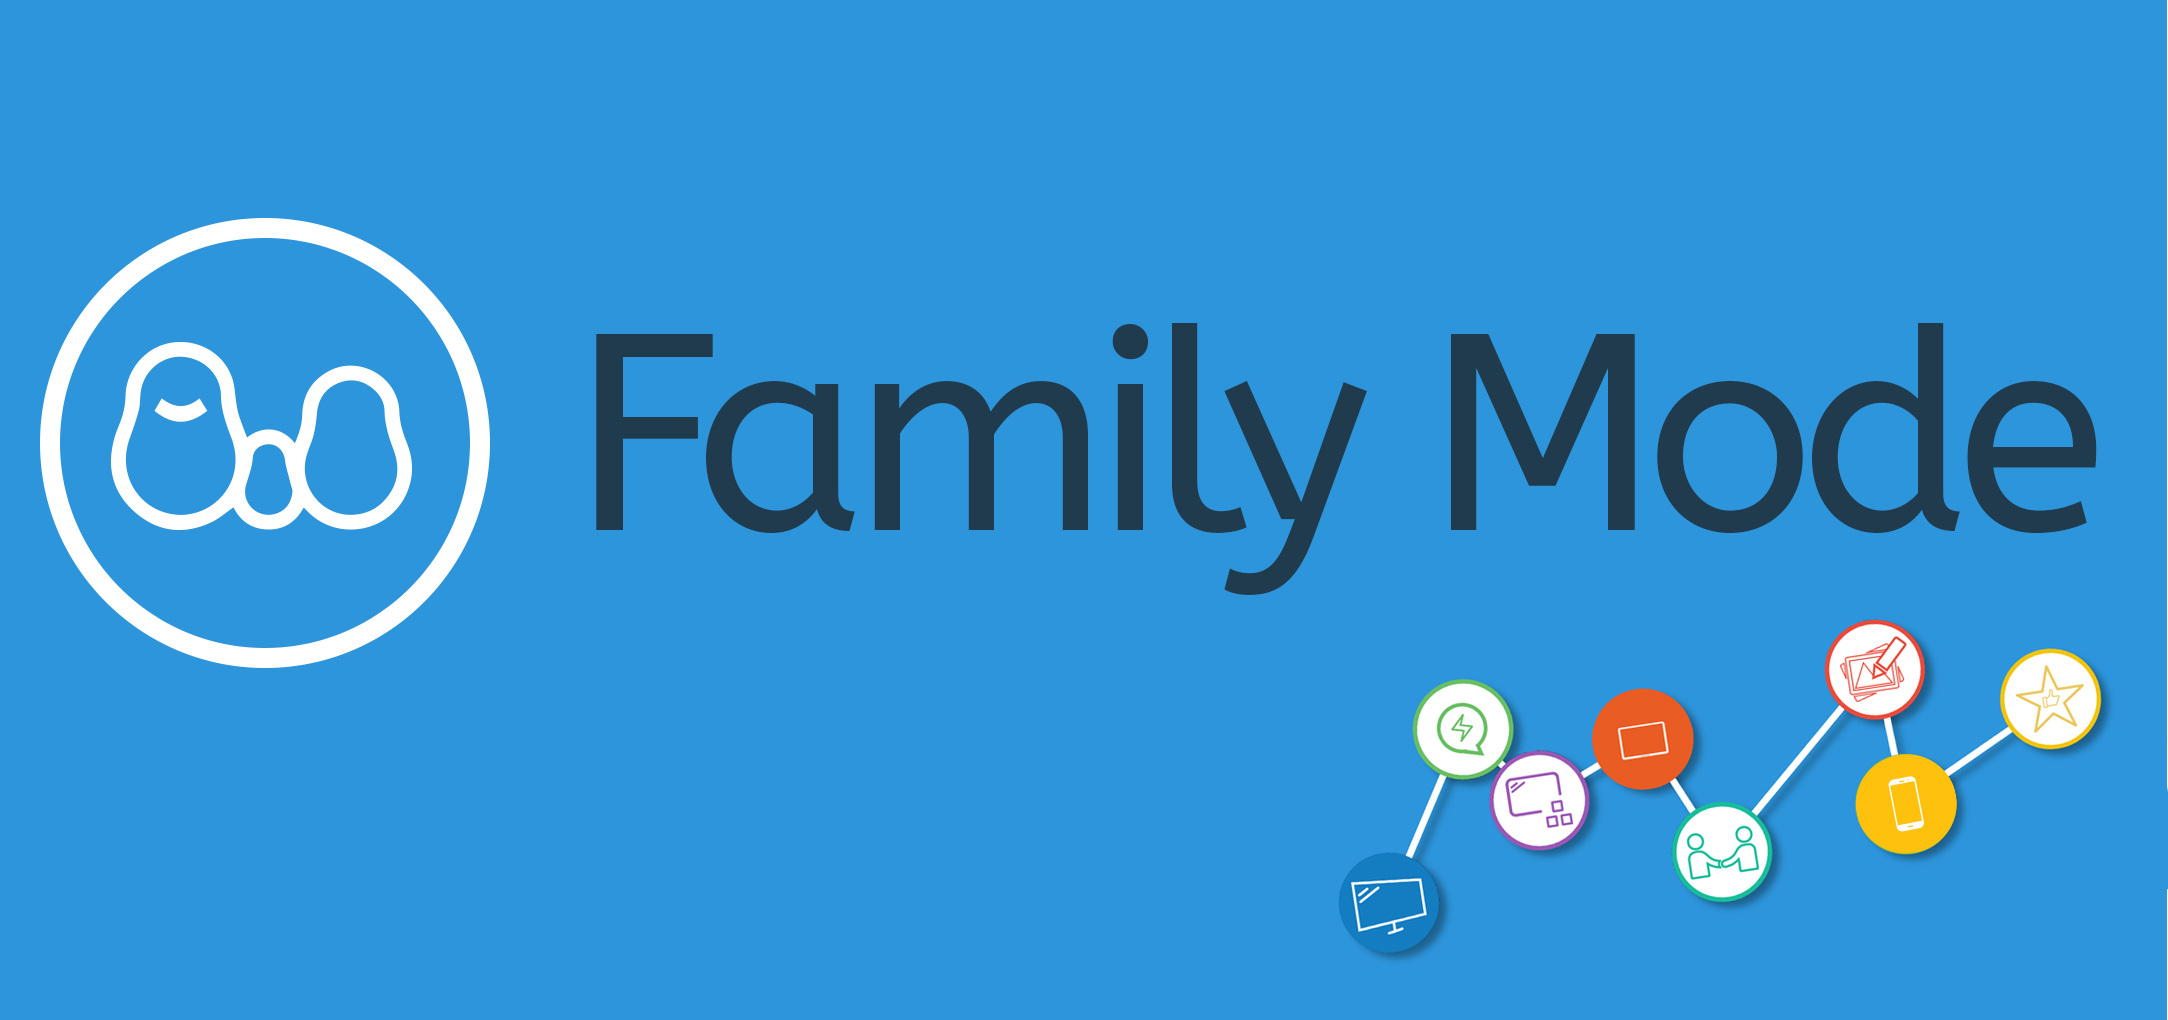 familymode_intro.jpg